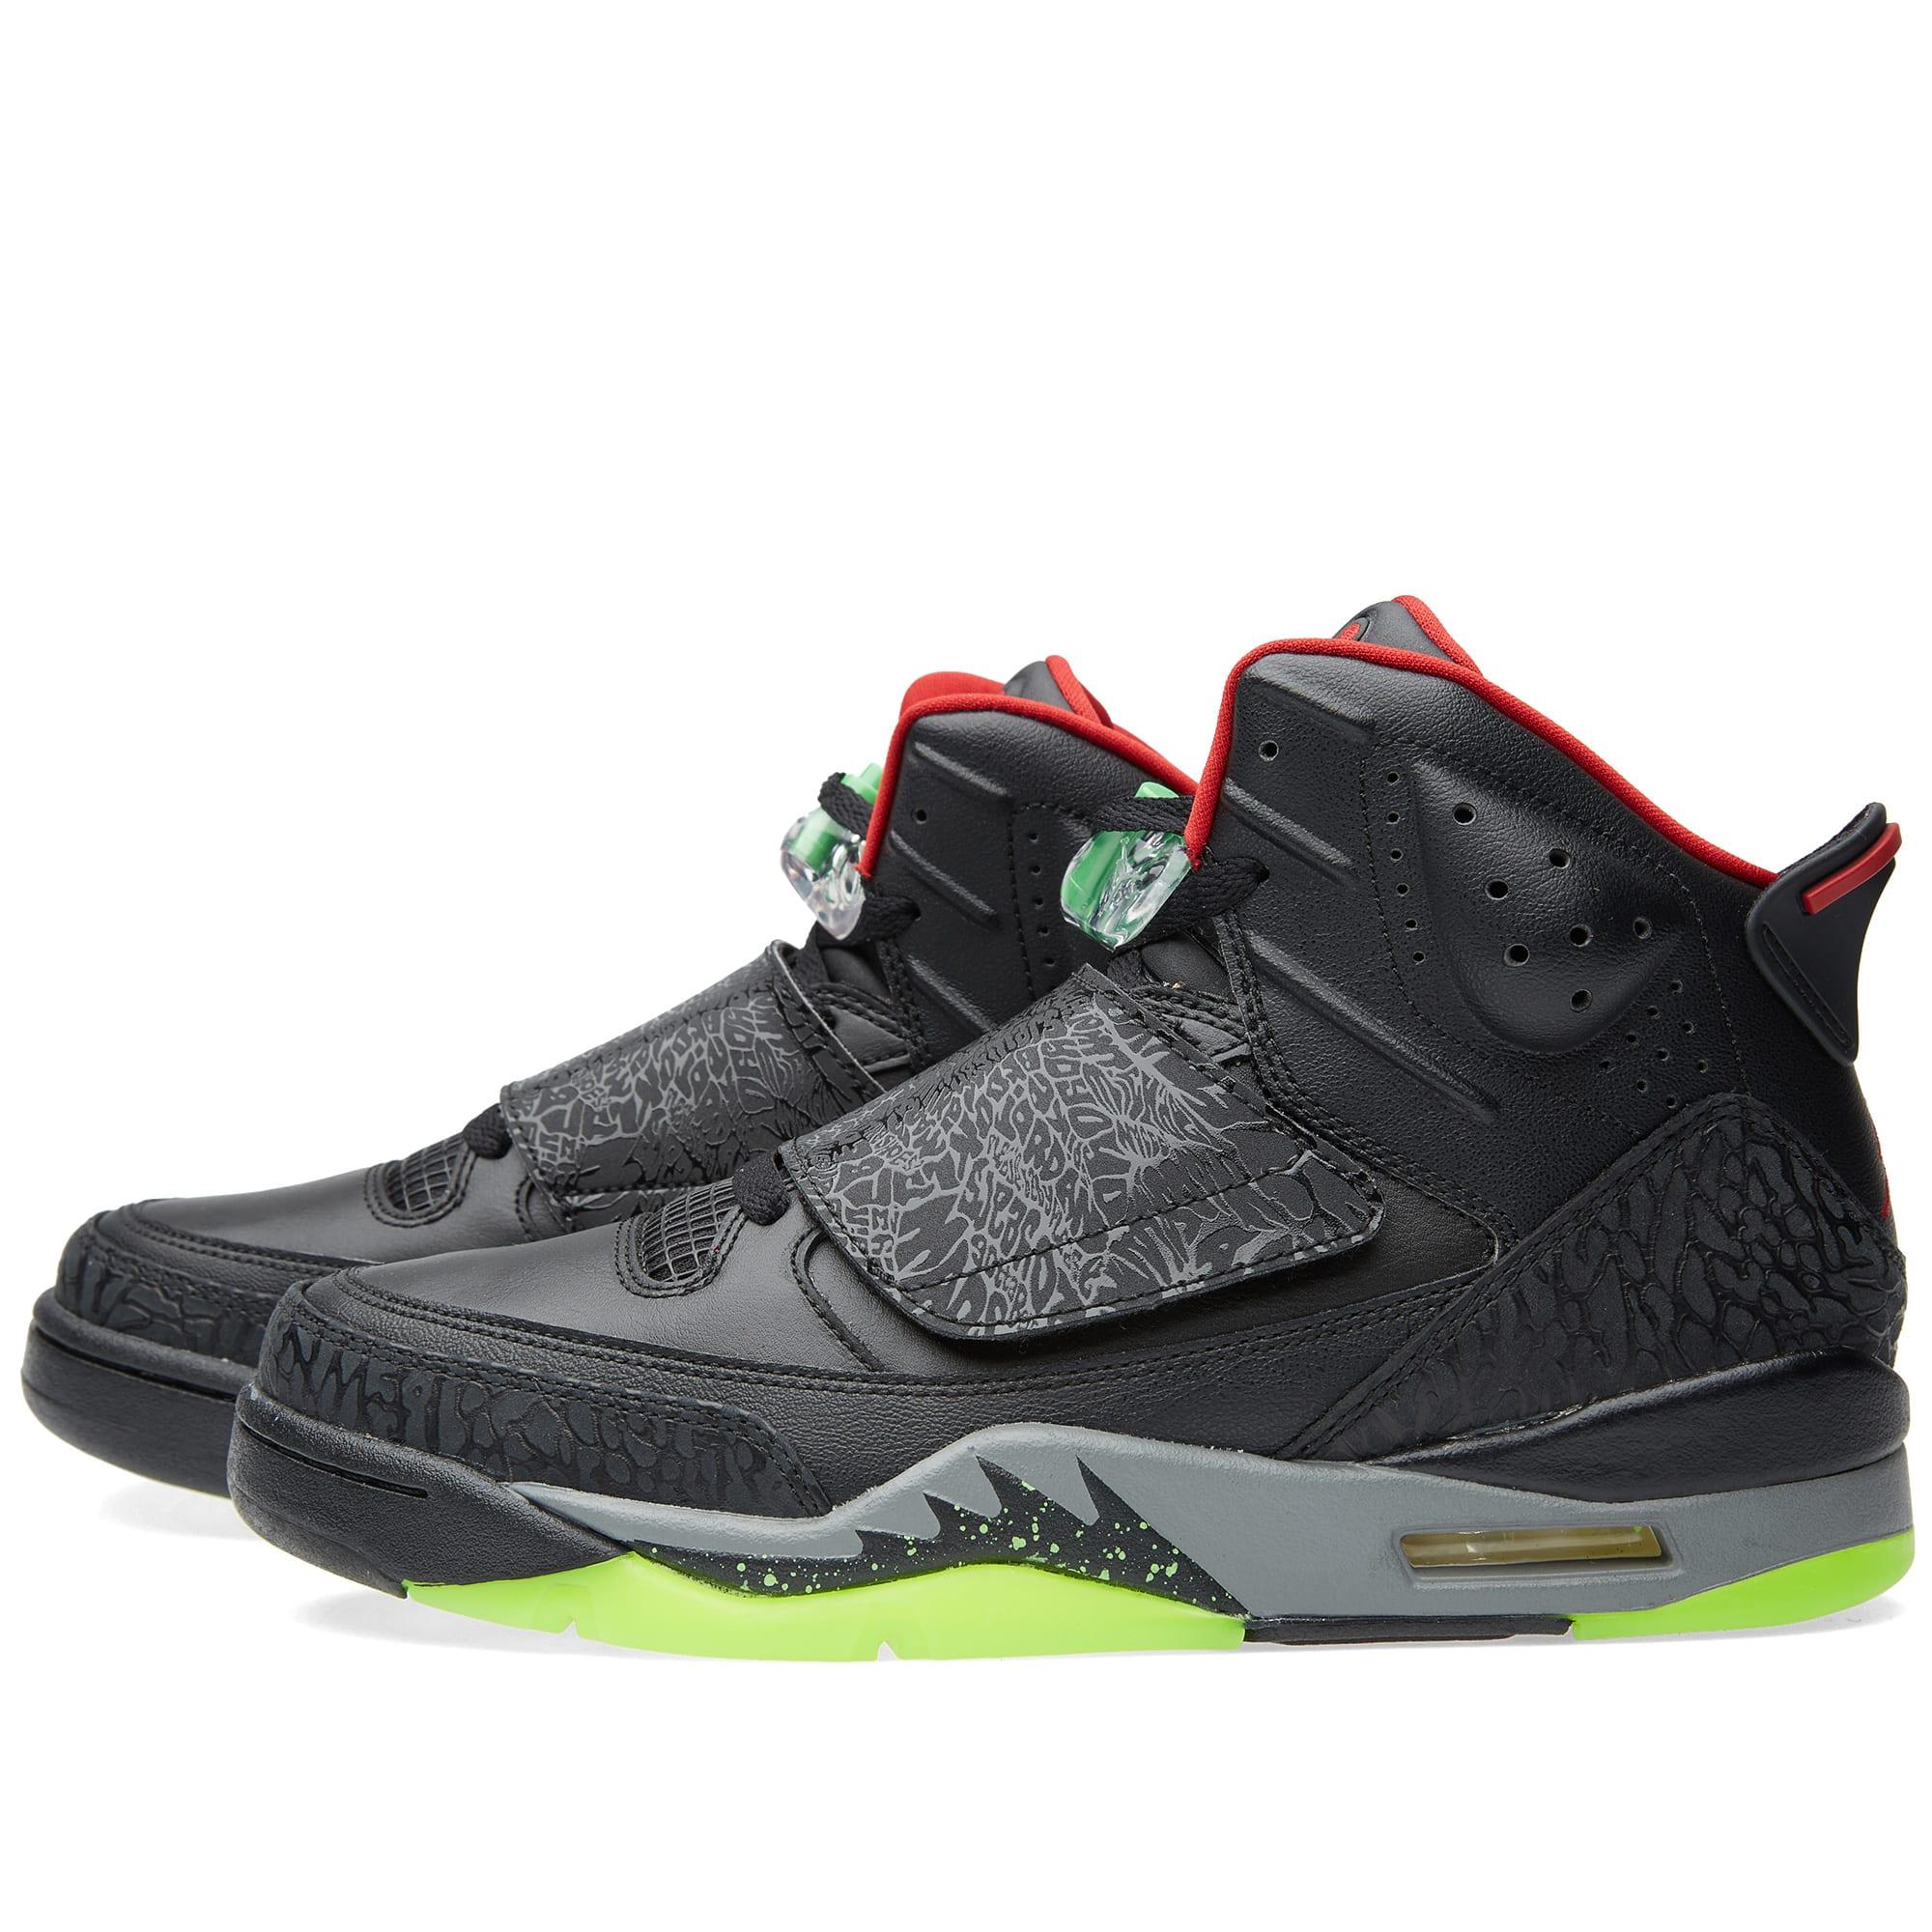 Nike Air Jordan Son of Mars Black, Gym